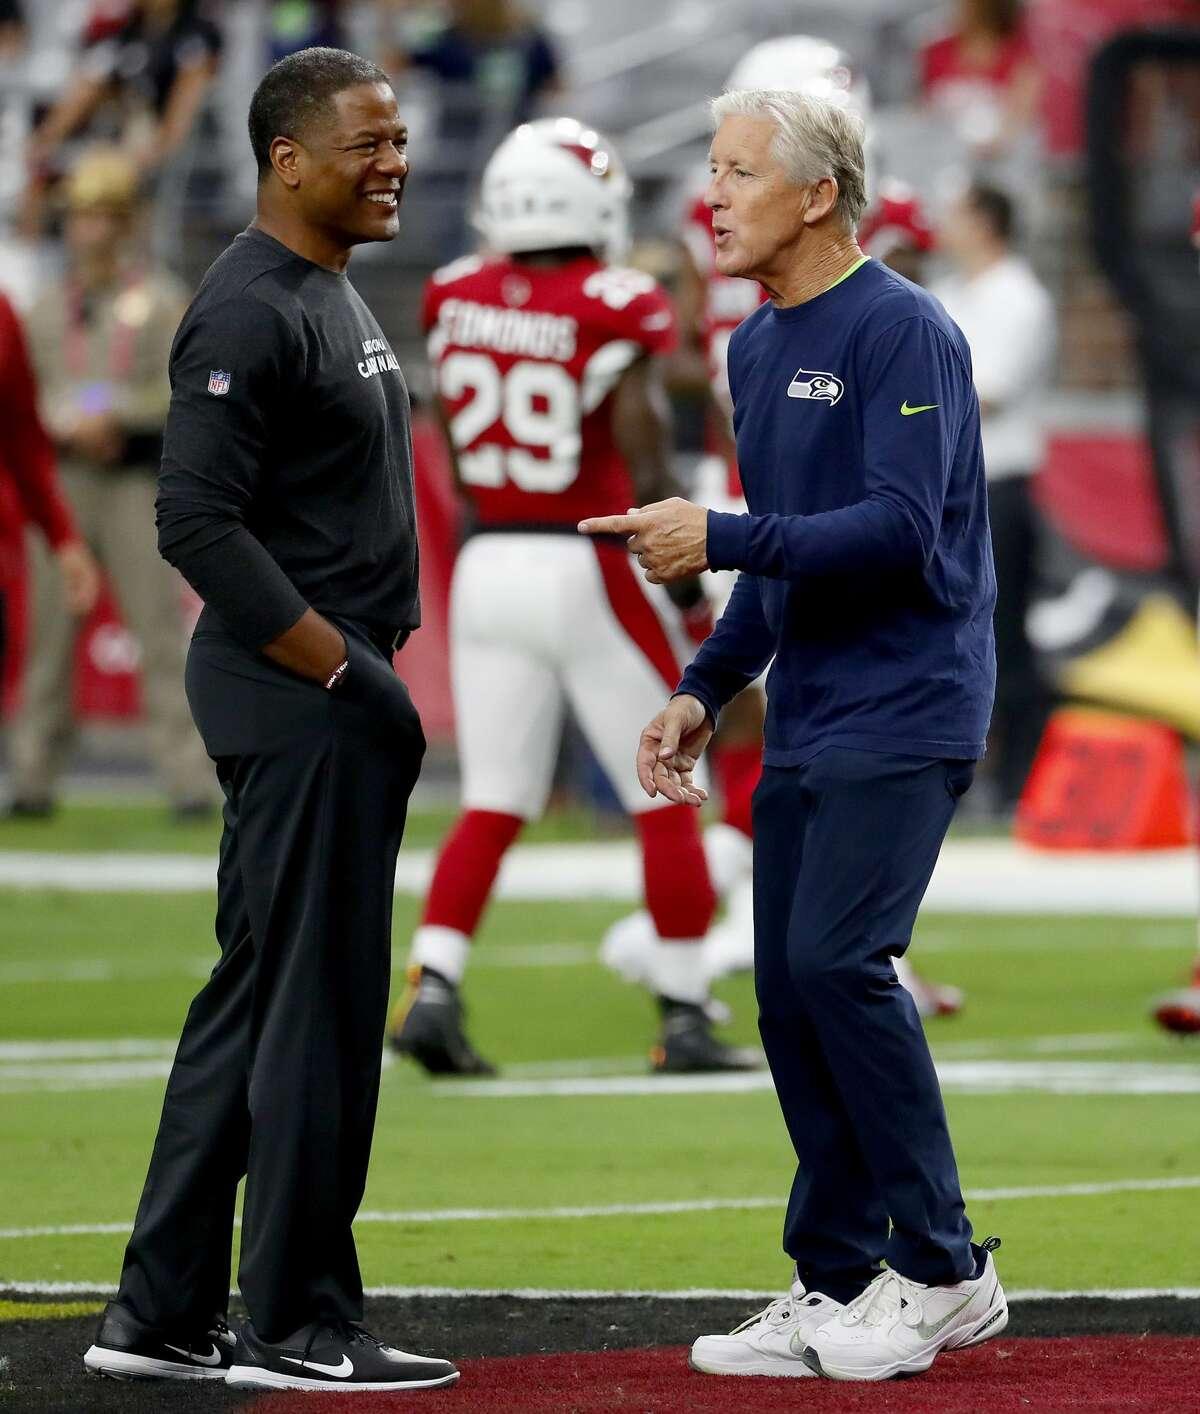 Seattle Seahawks head coach Pete Carroll, right, greets Arizona Cardinals head coach Steve Wilks prior to an NFL football game, Sunday, Sept. 30, 2018, in Glendale, Ariz. (AP Photo/Rick Scuteri)